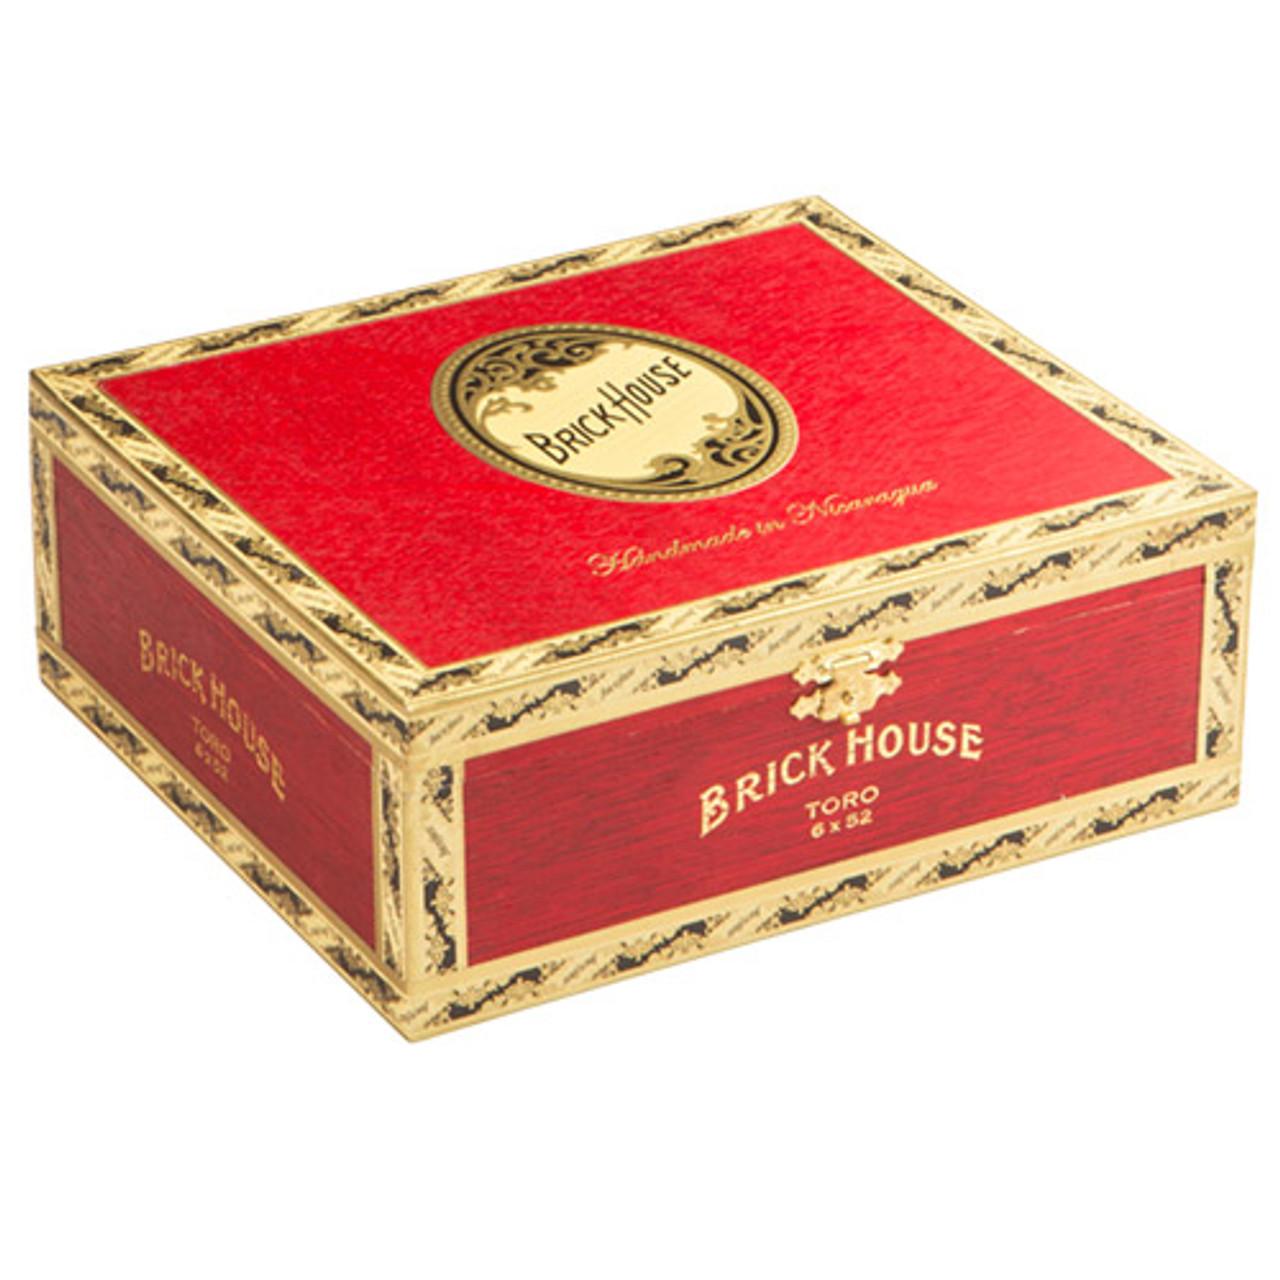 Brick House Toro Cigars - 6 x 52 (Box of 25)